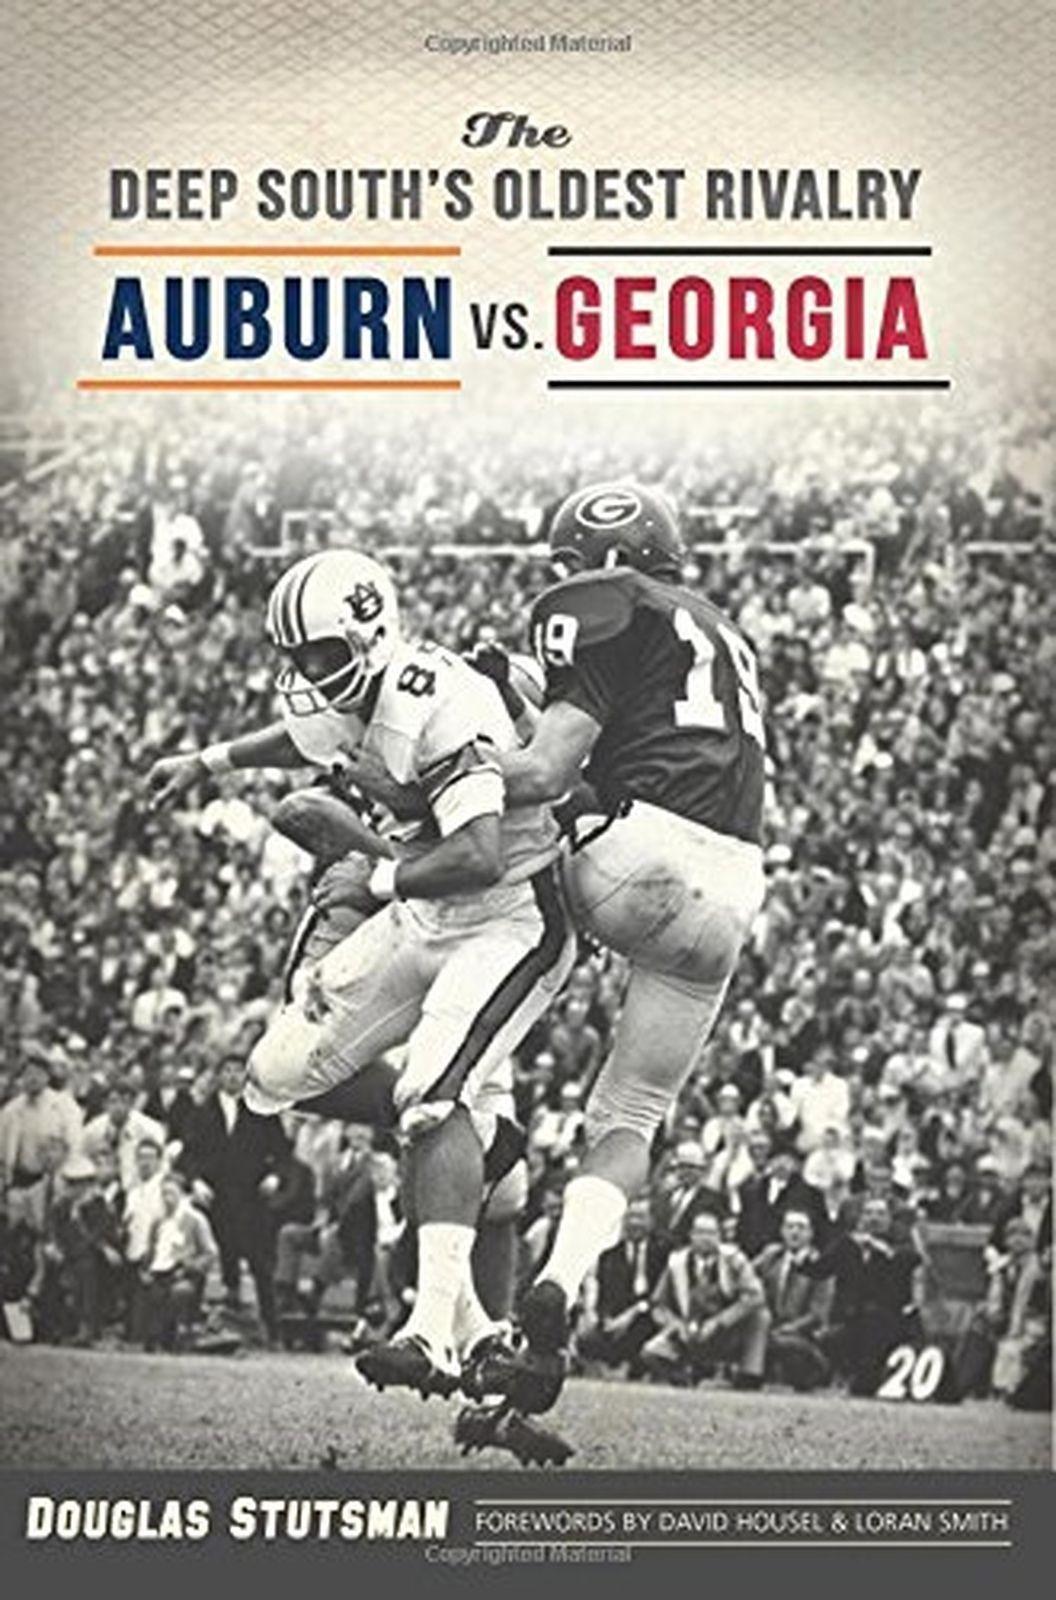 The Deep South's Oldest Rivalry Auburn vs.